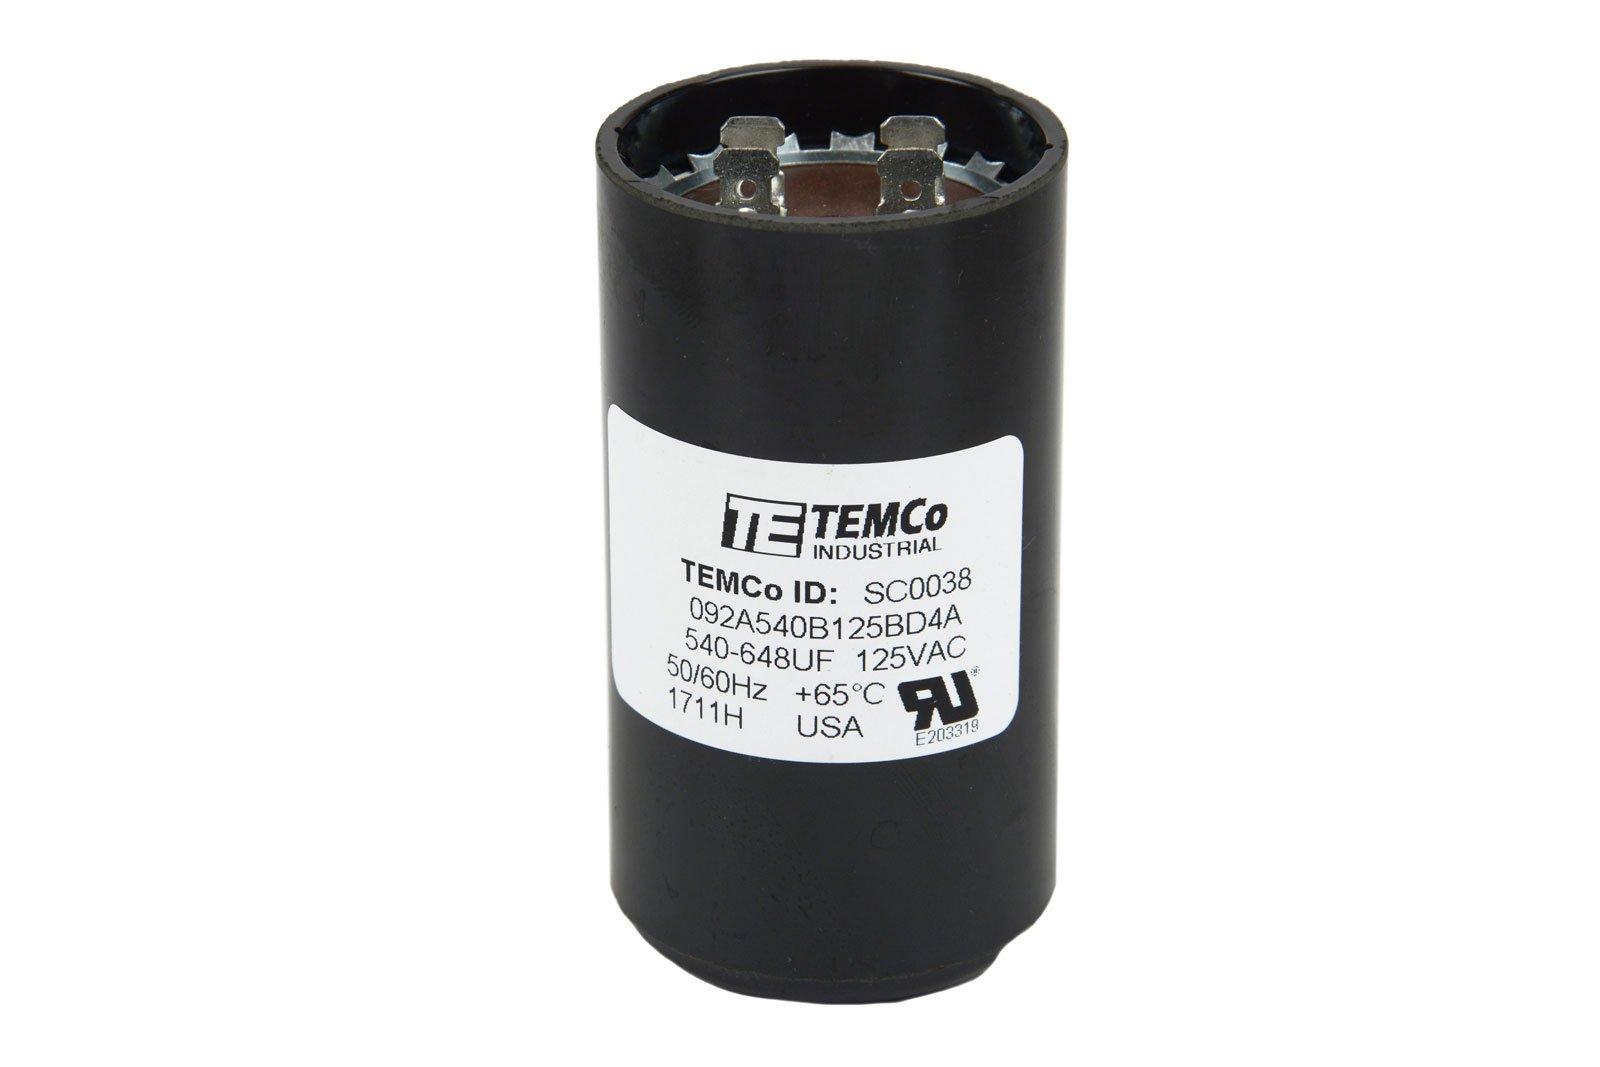 TEMCo Motor Start Capacitor SC0038-540-648 mfd 110-125 V VAC Volt uf Round HVAC AC Electric